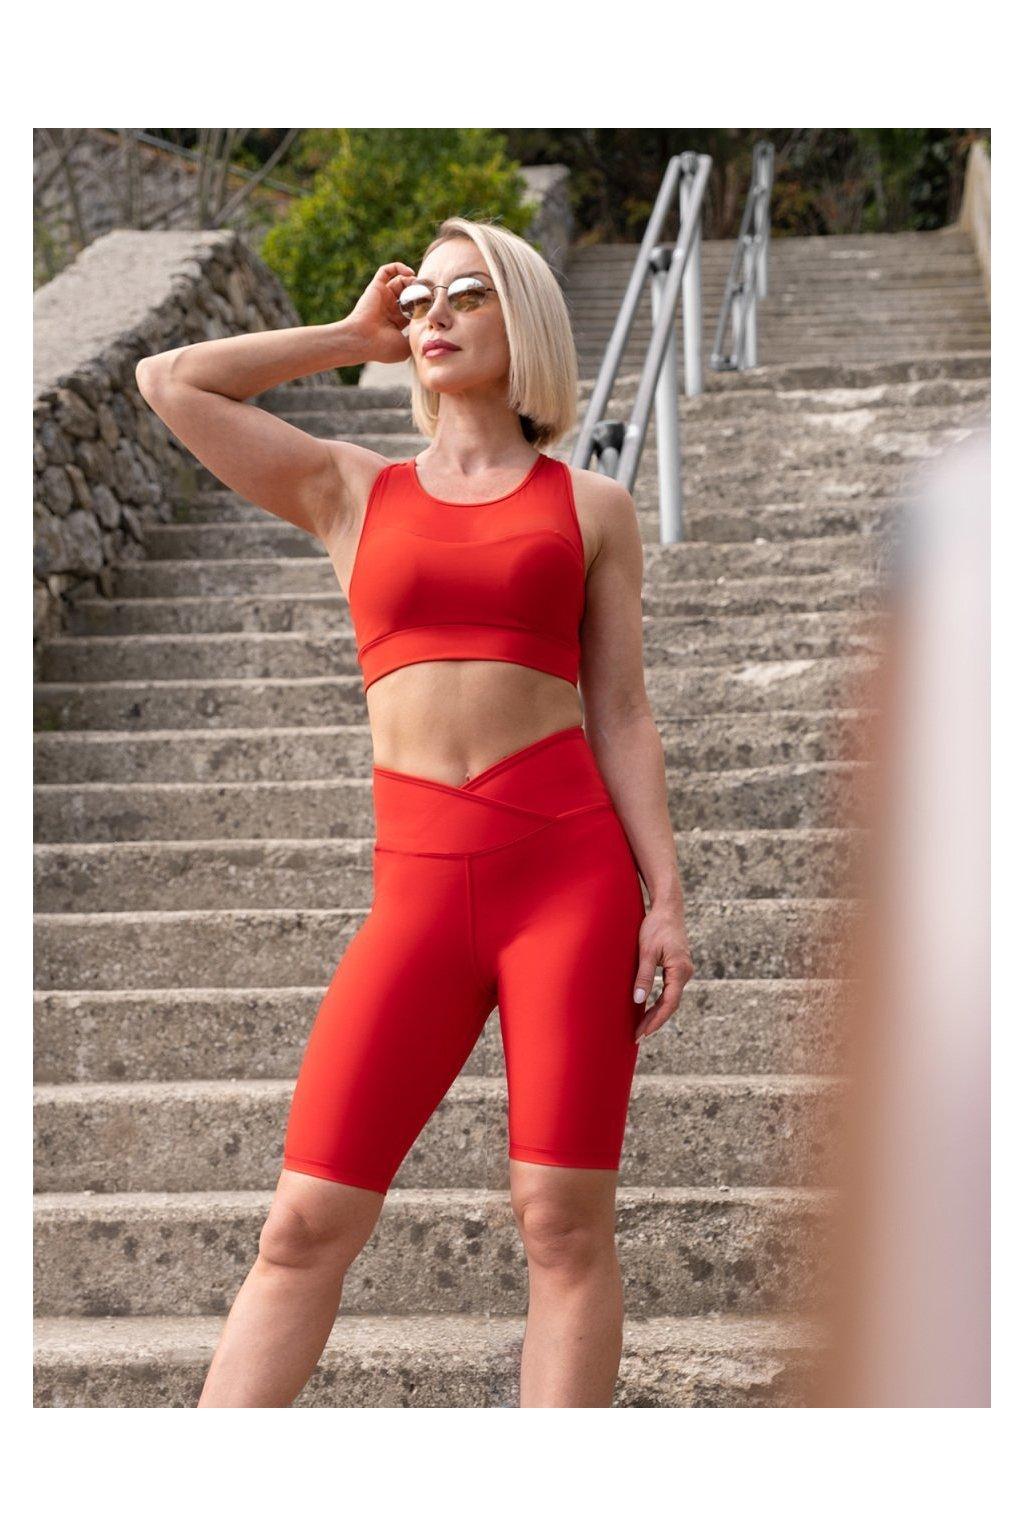 Dámské BIKER kraťasy - vysoký pás V - červené model